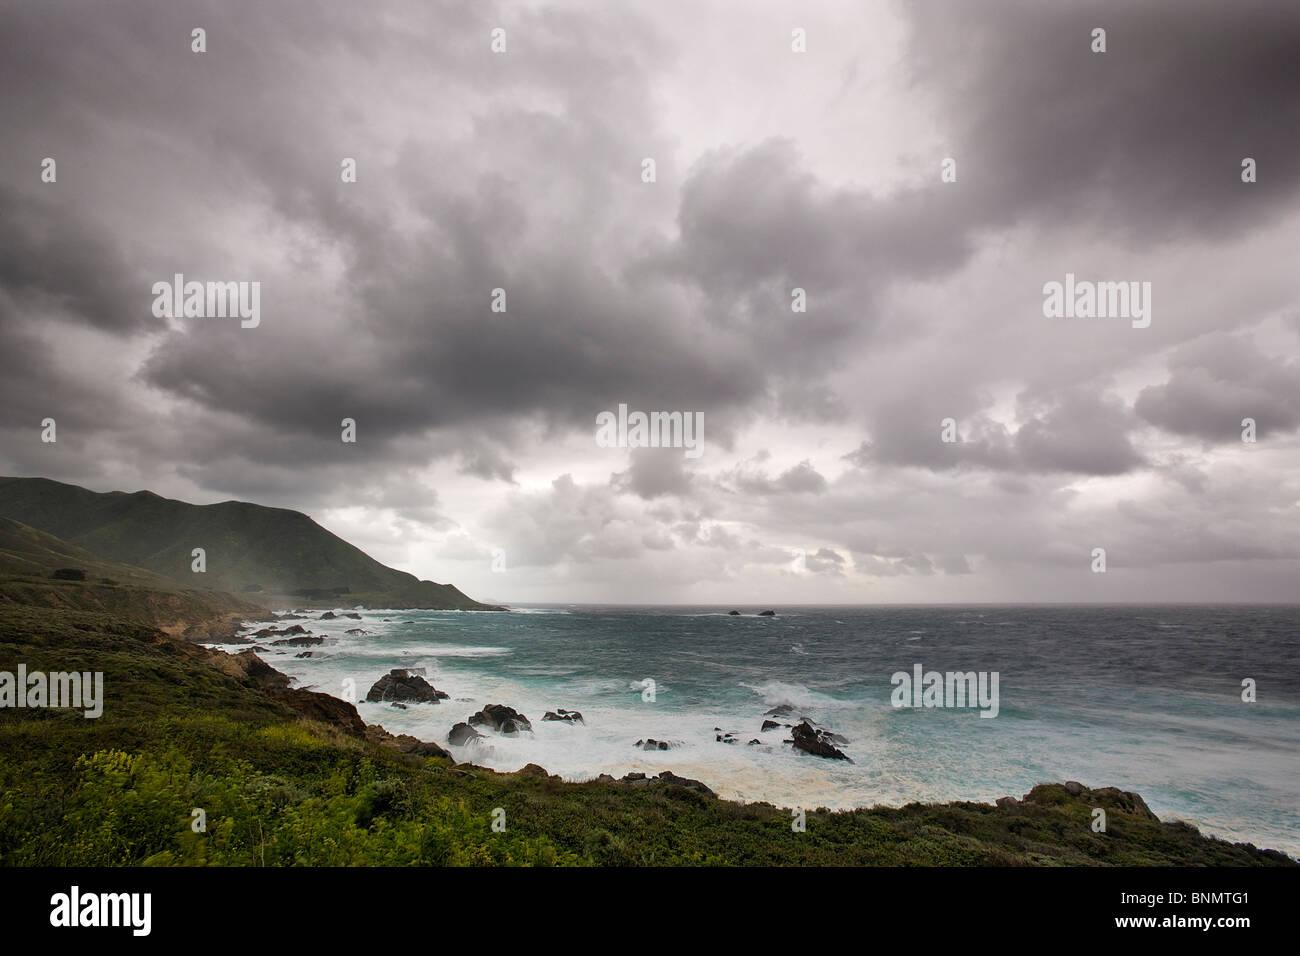 Big Sur coast, California, USA. Stock Photo